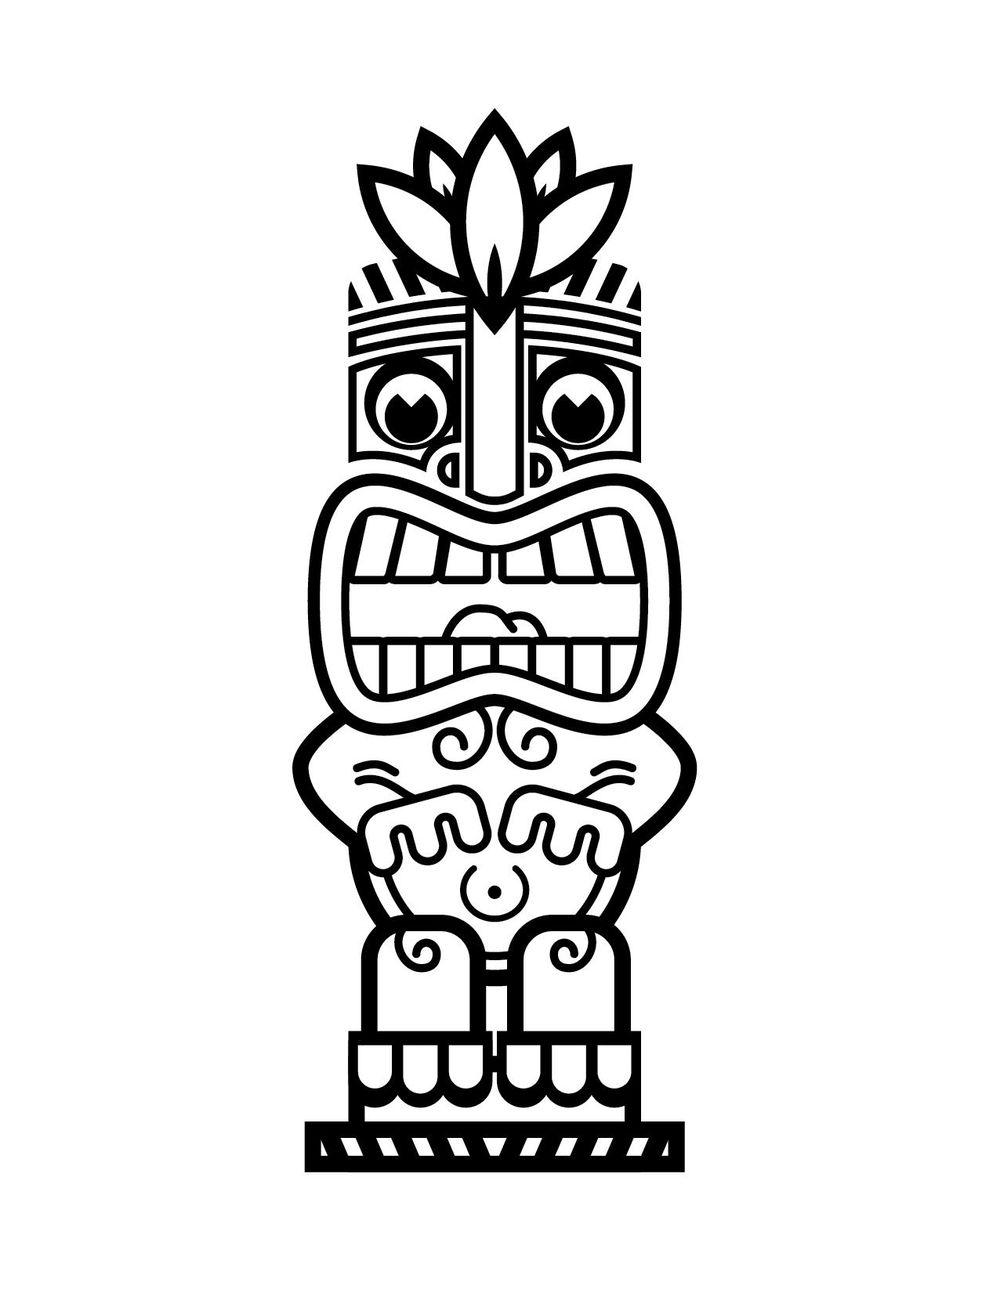 Tiki Man - Digital - image 1 - student project